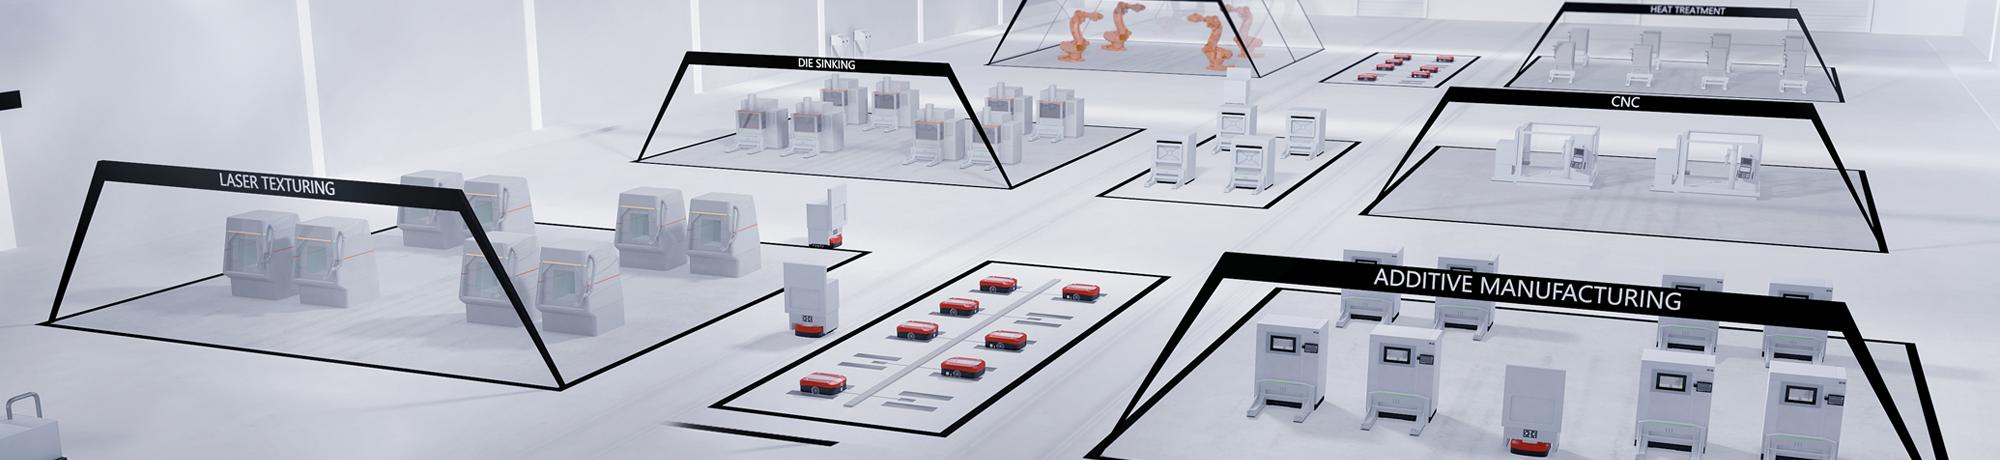 Bild: EOS GmbH - Factory-Future